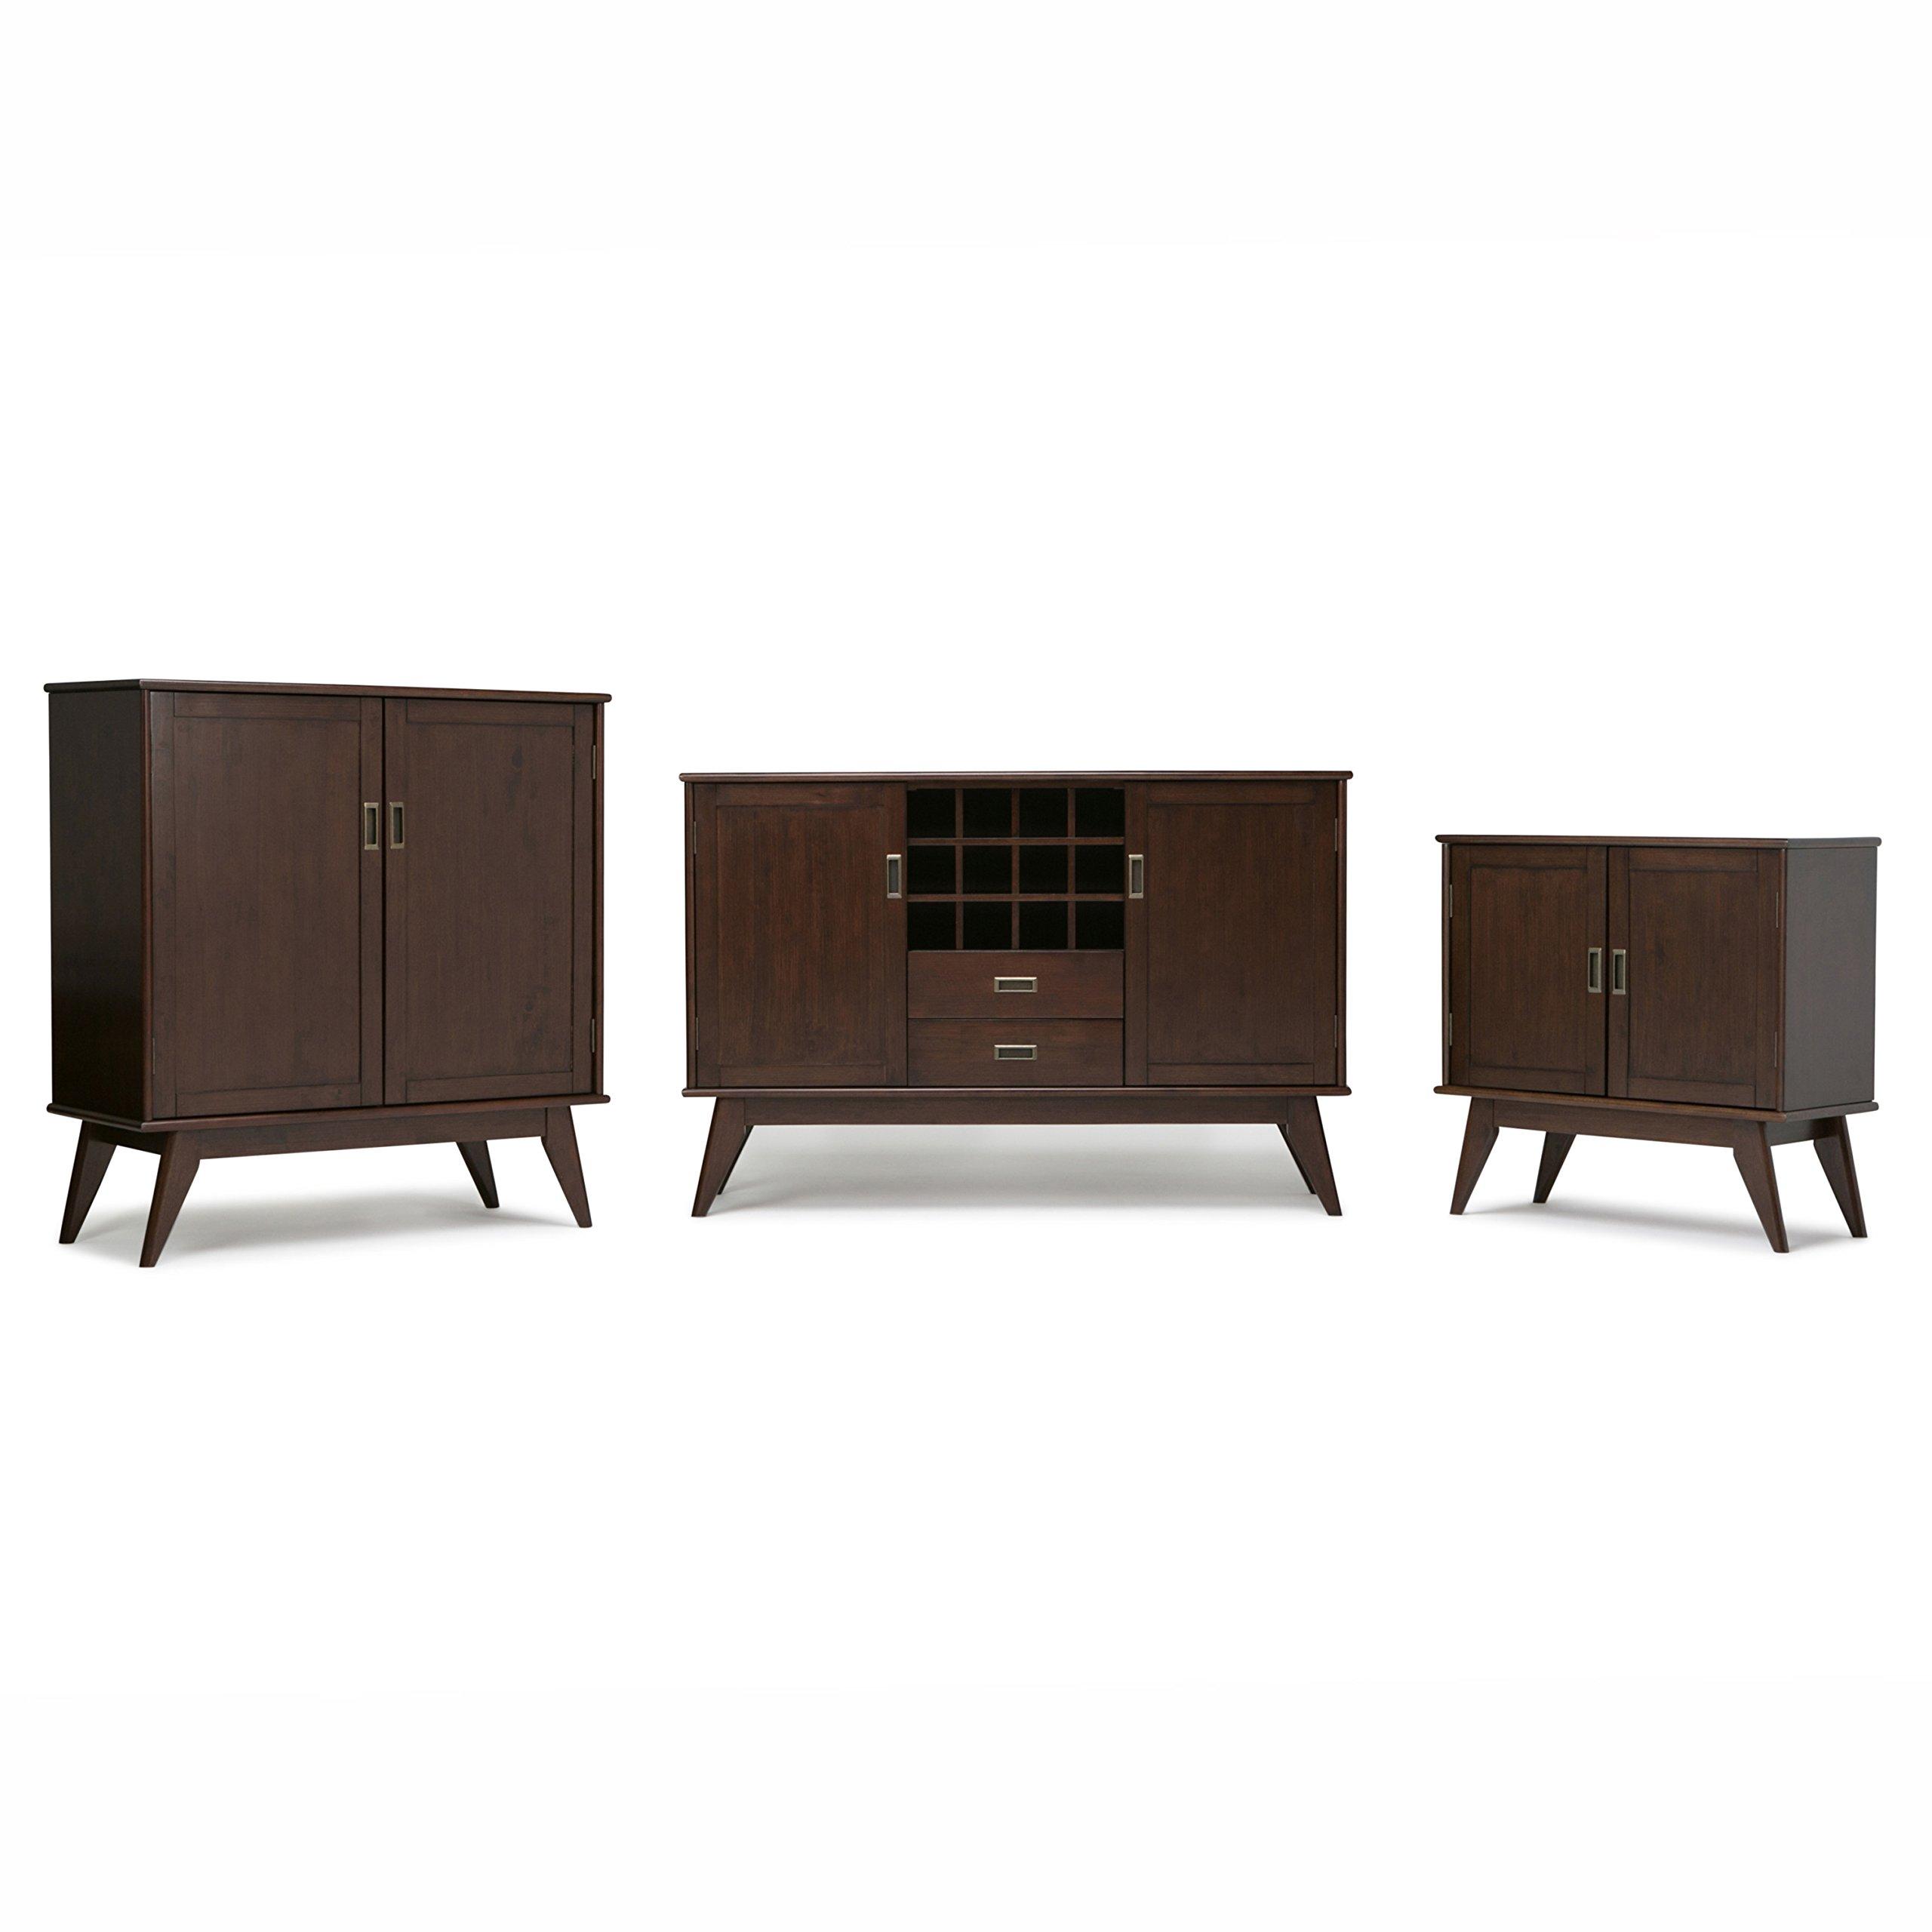 Simpli Home Draper Mid Century Solid Hardwood Storage Cabinet, Medium, Auburn Brown by Simpli Home (Image #5)